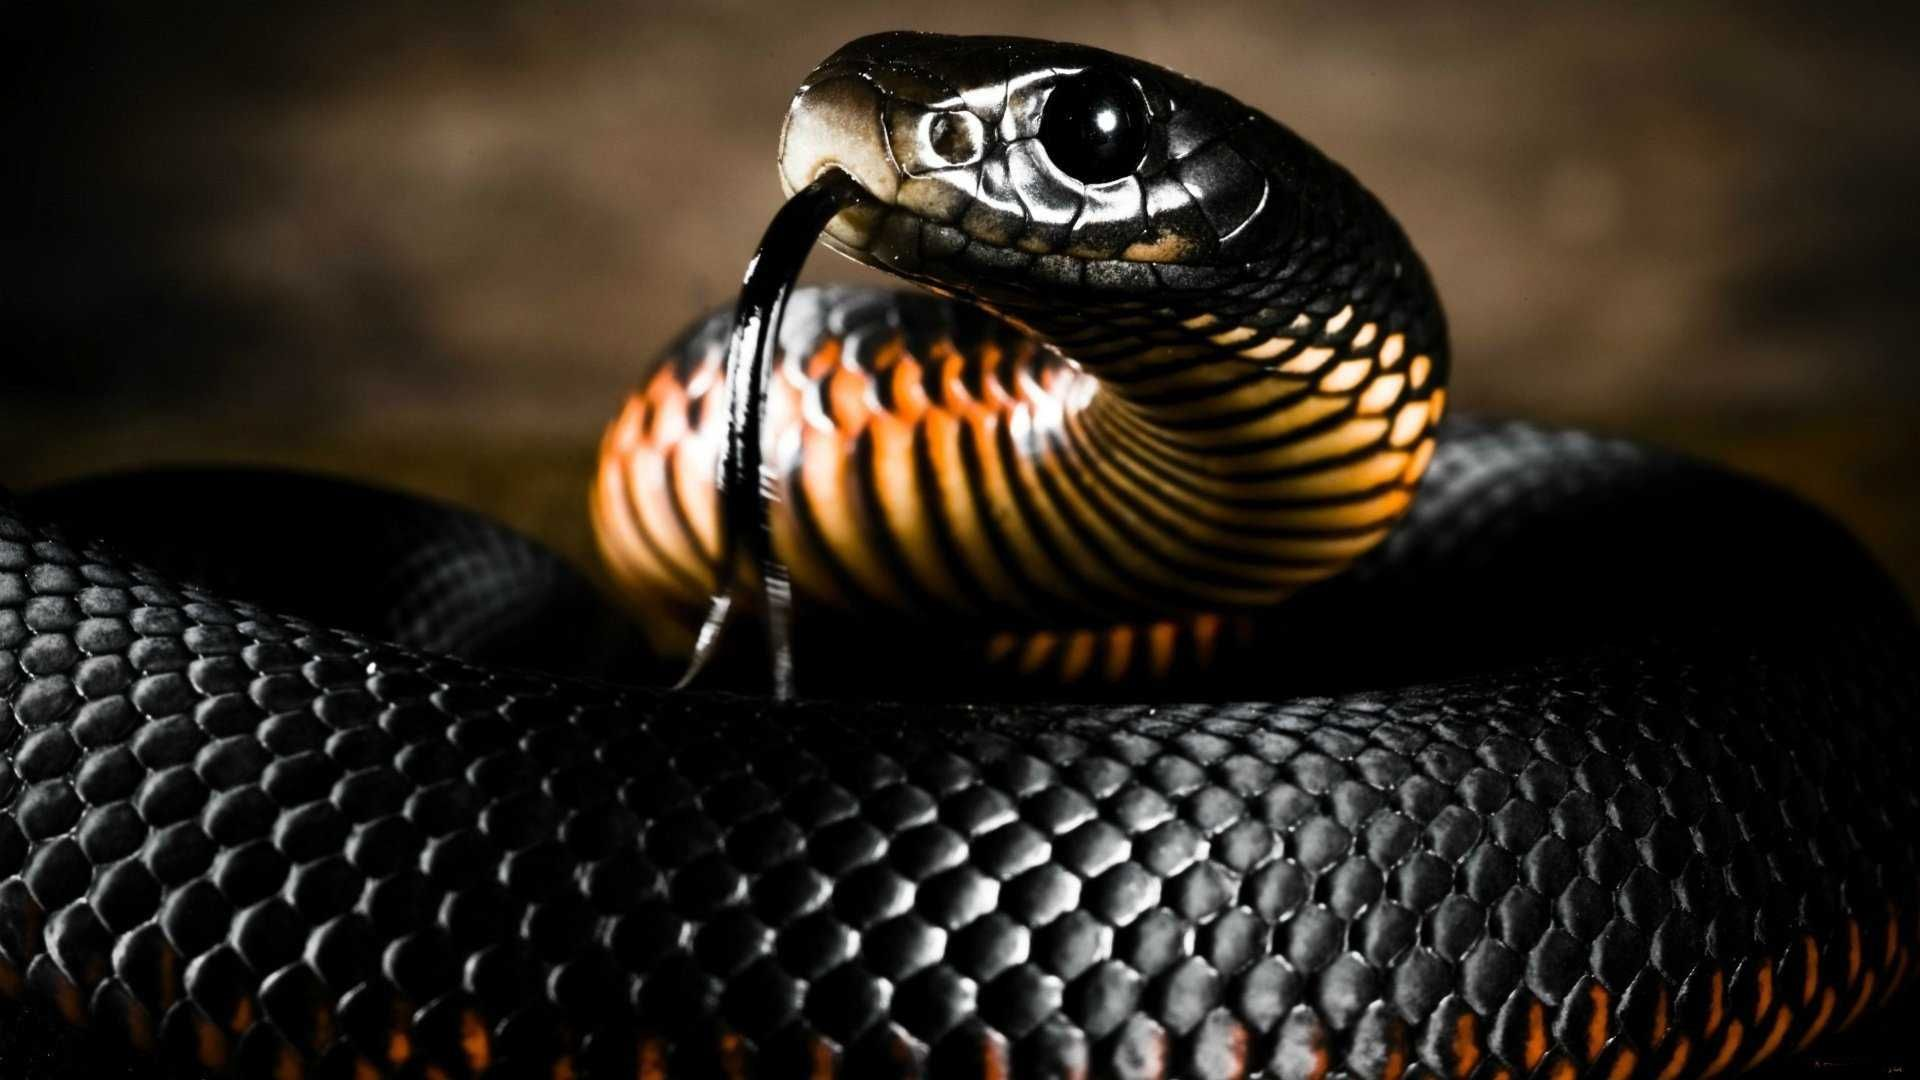 Black Mamba Snake Collection Jpg 1920 1080 Snake Wallpaper Mamba Snake Black Mamba Snake